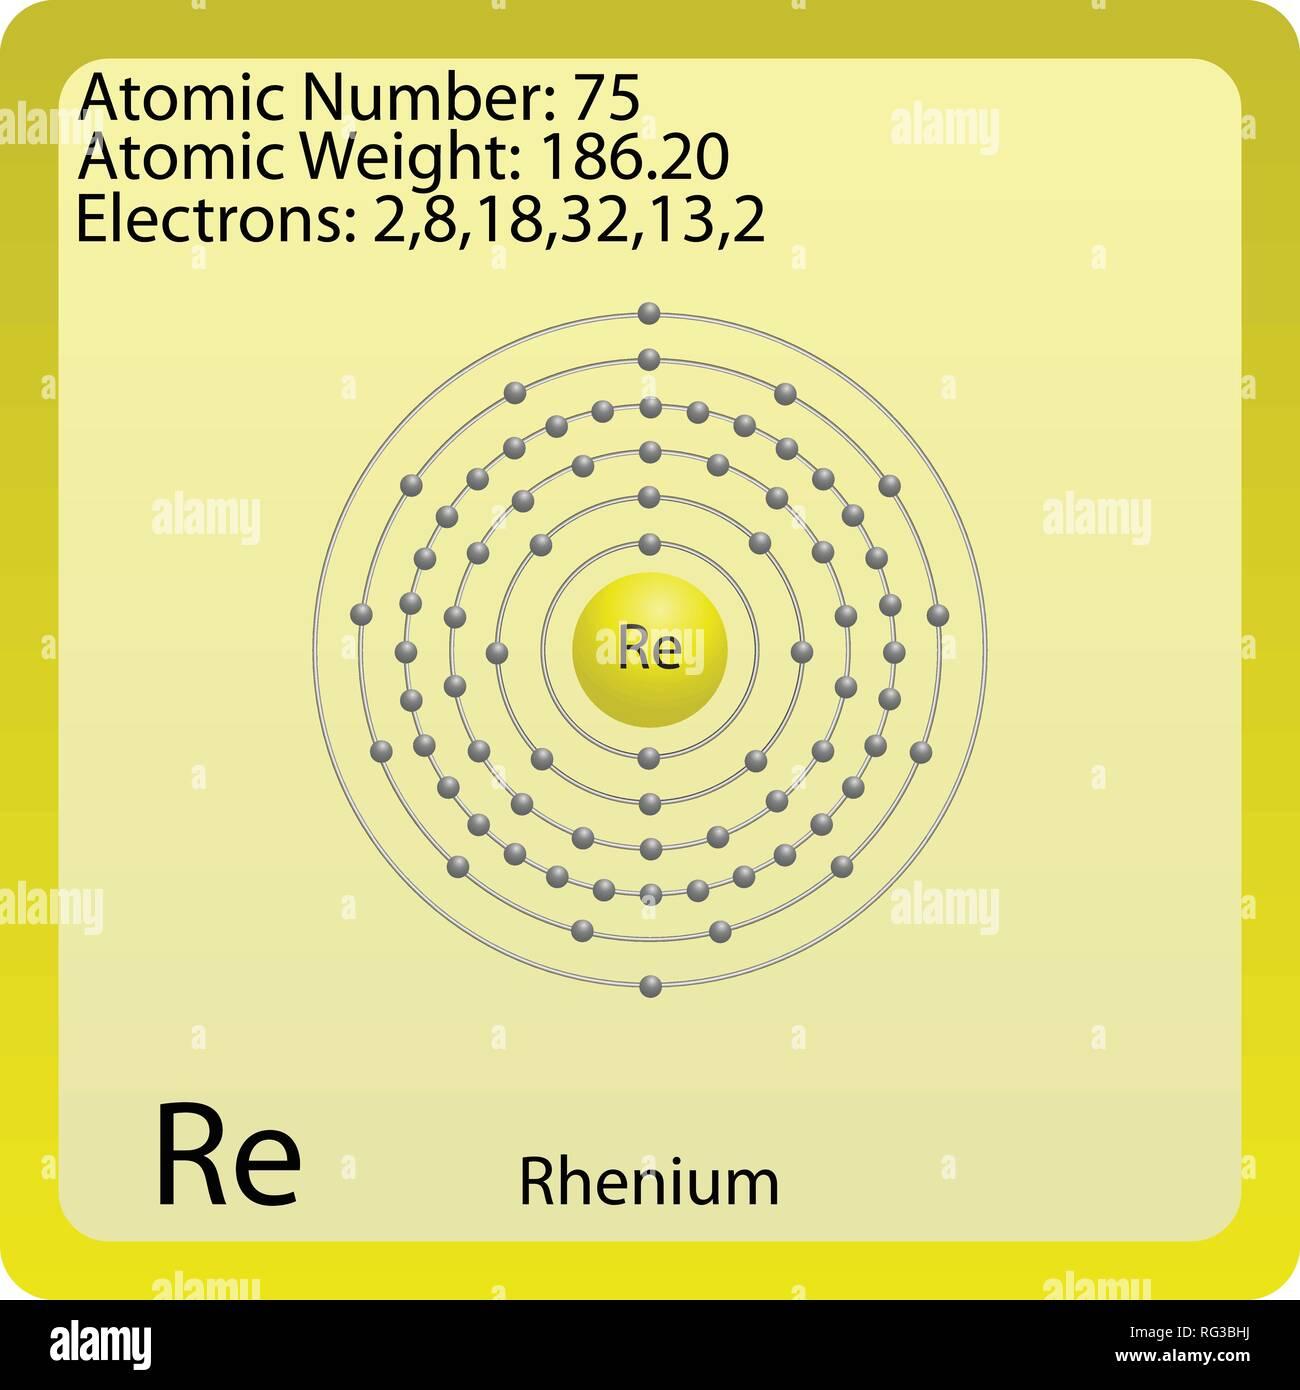 hight resolution of atom symbol for rhenium